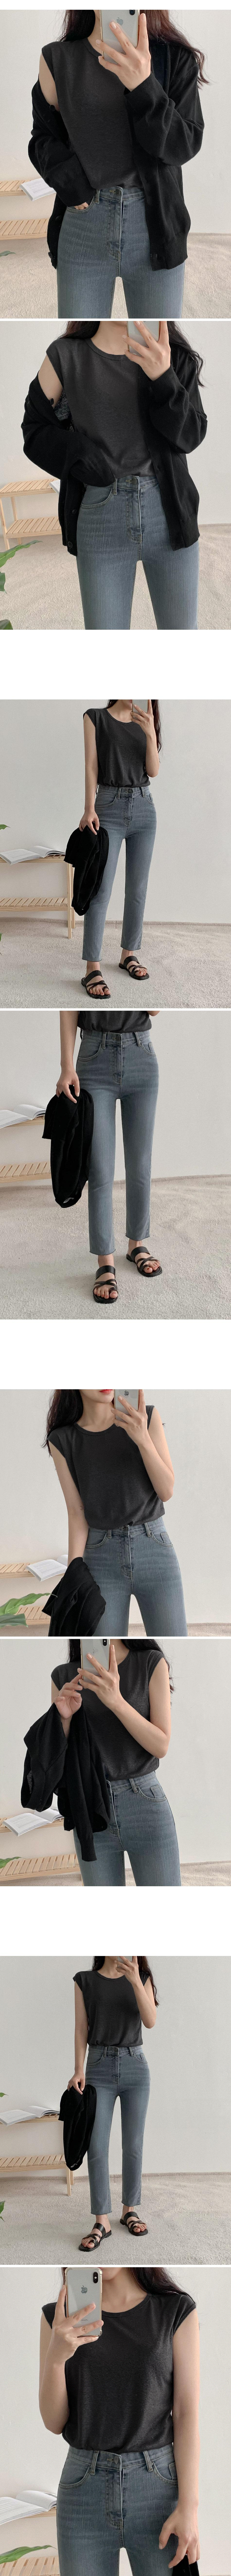 teen cross sandals slippers